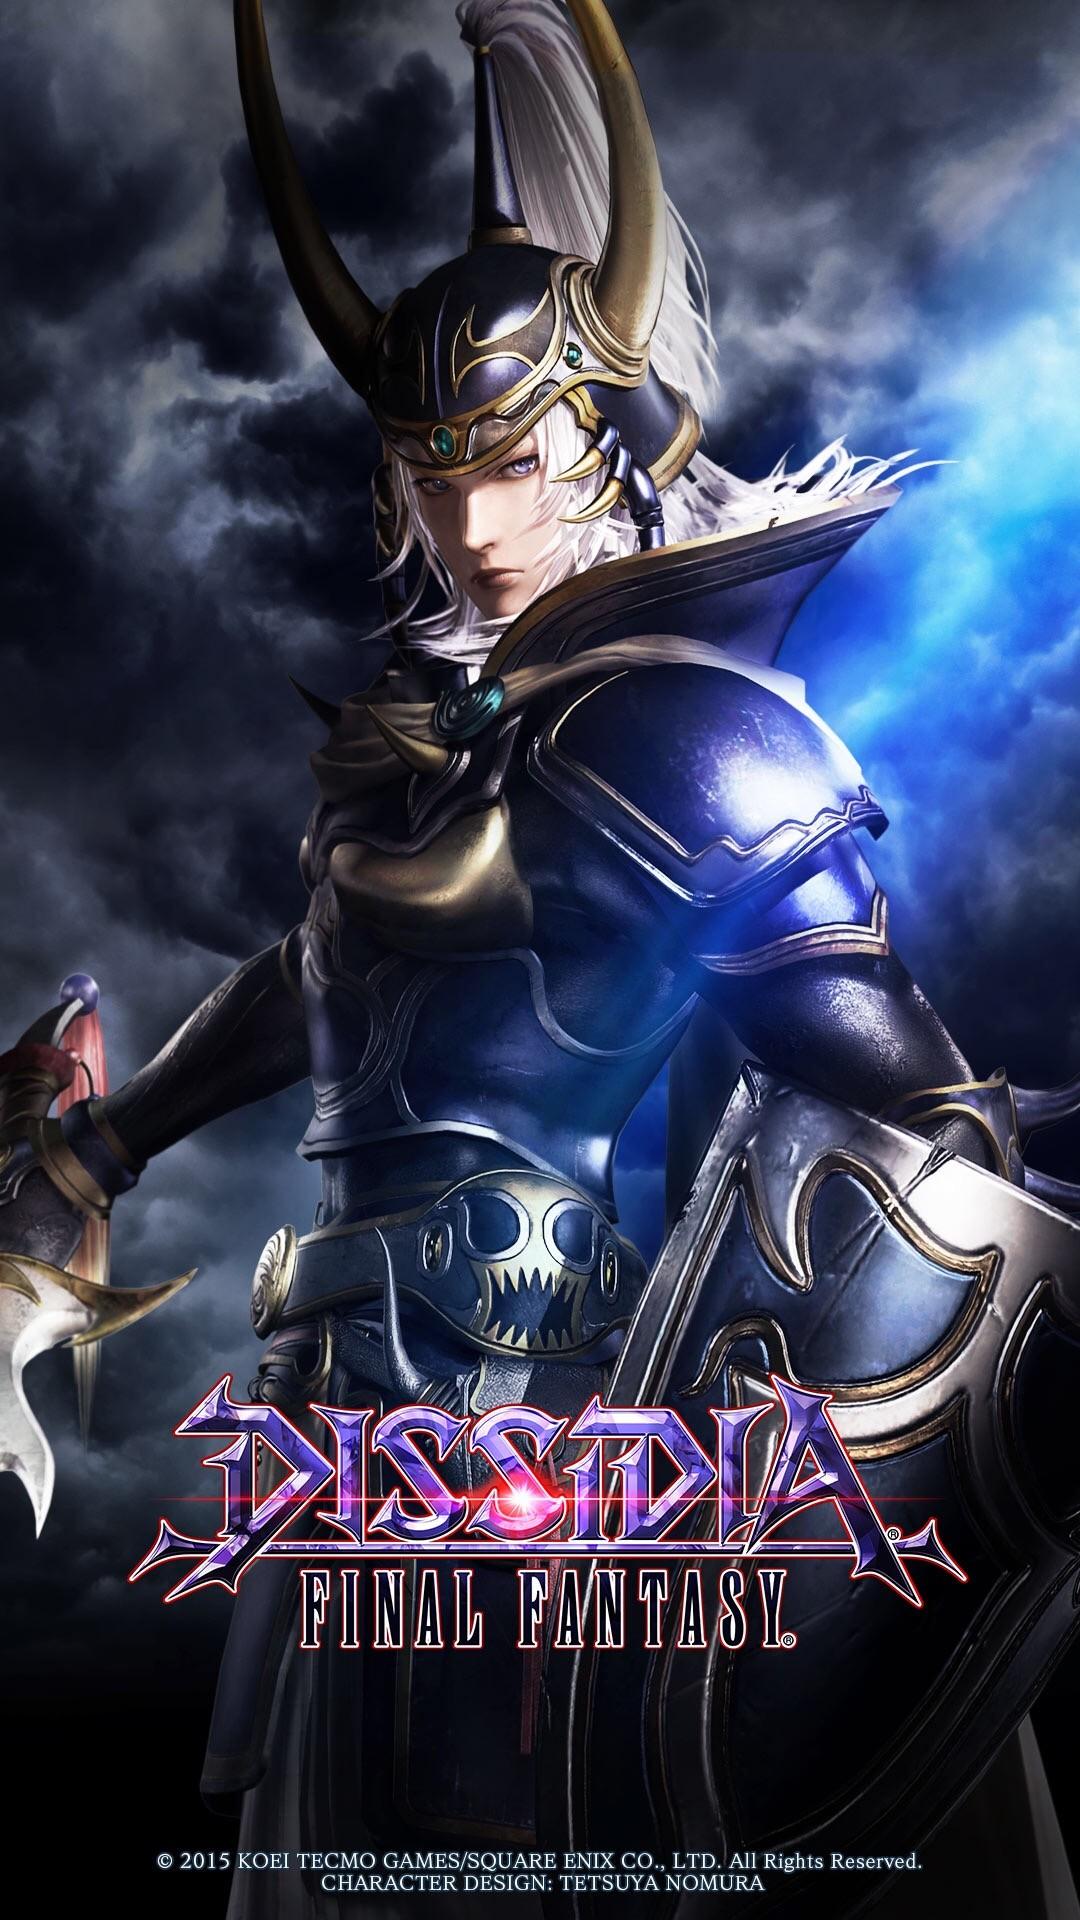 Final Fantasy Dissidia Wallpaper 62 Images